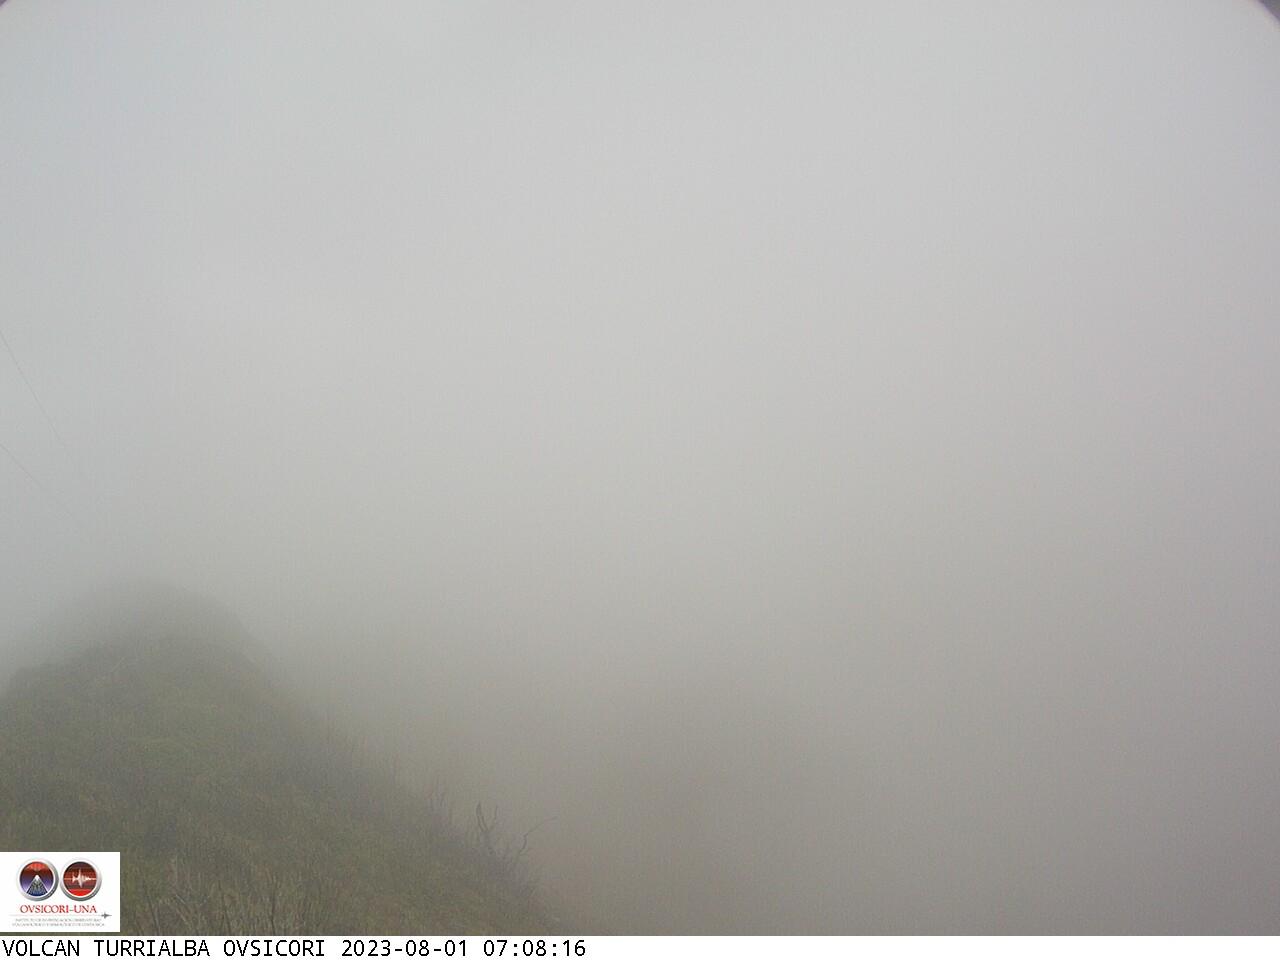 Volcano Turrialba Sun. 07:08